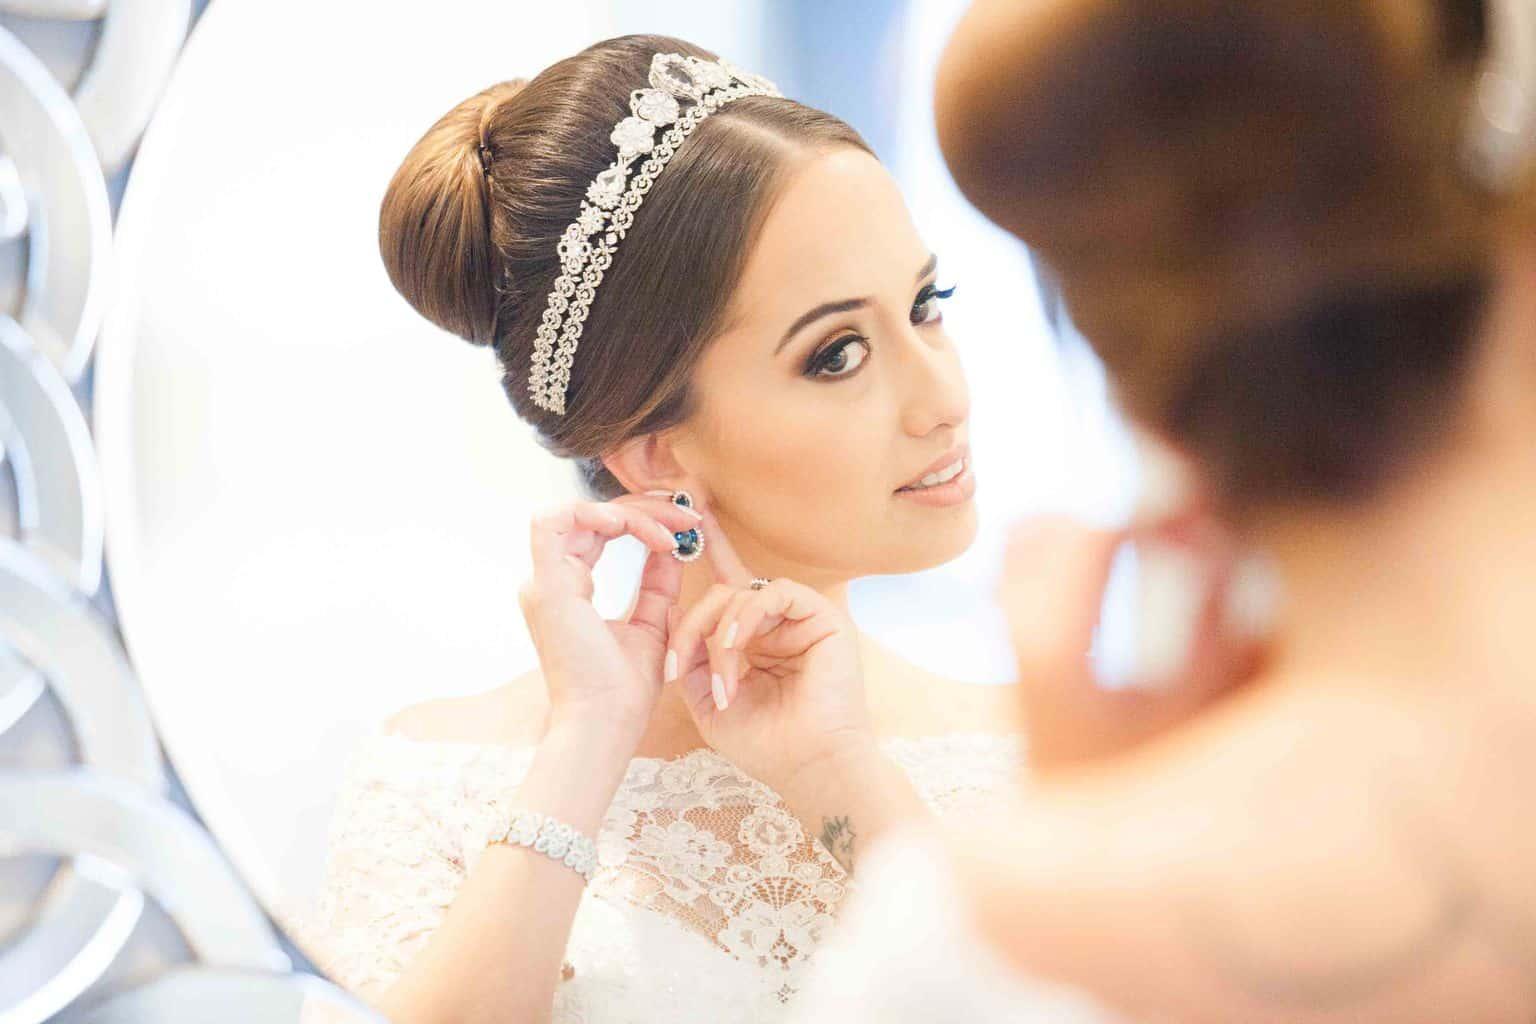 Brinco-Casamento-Clássico-Casamento-tradicional-Copacabana-Palace-Monica-Roias-Ribas-Foto-e-Vídeo-Tuanny-e-Bernardo-CaseMe